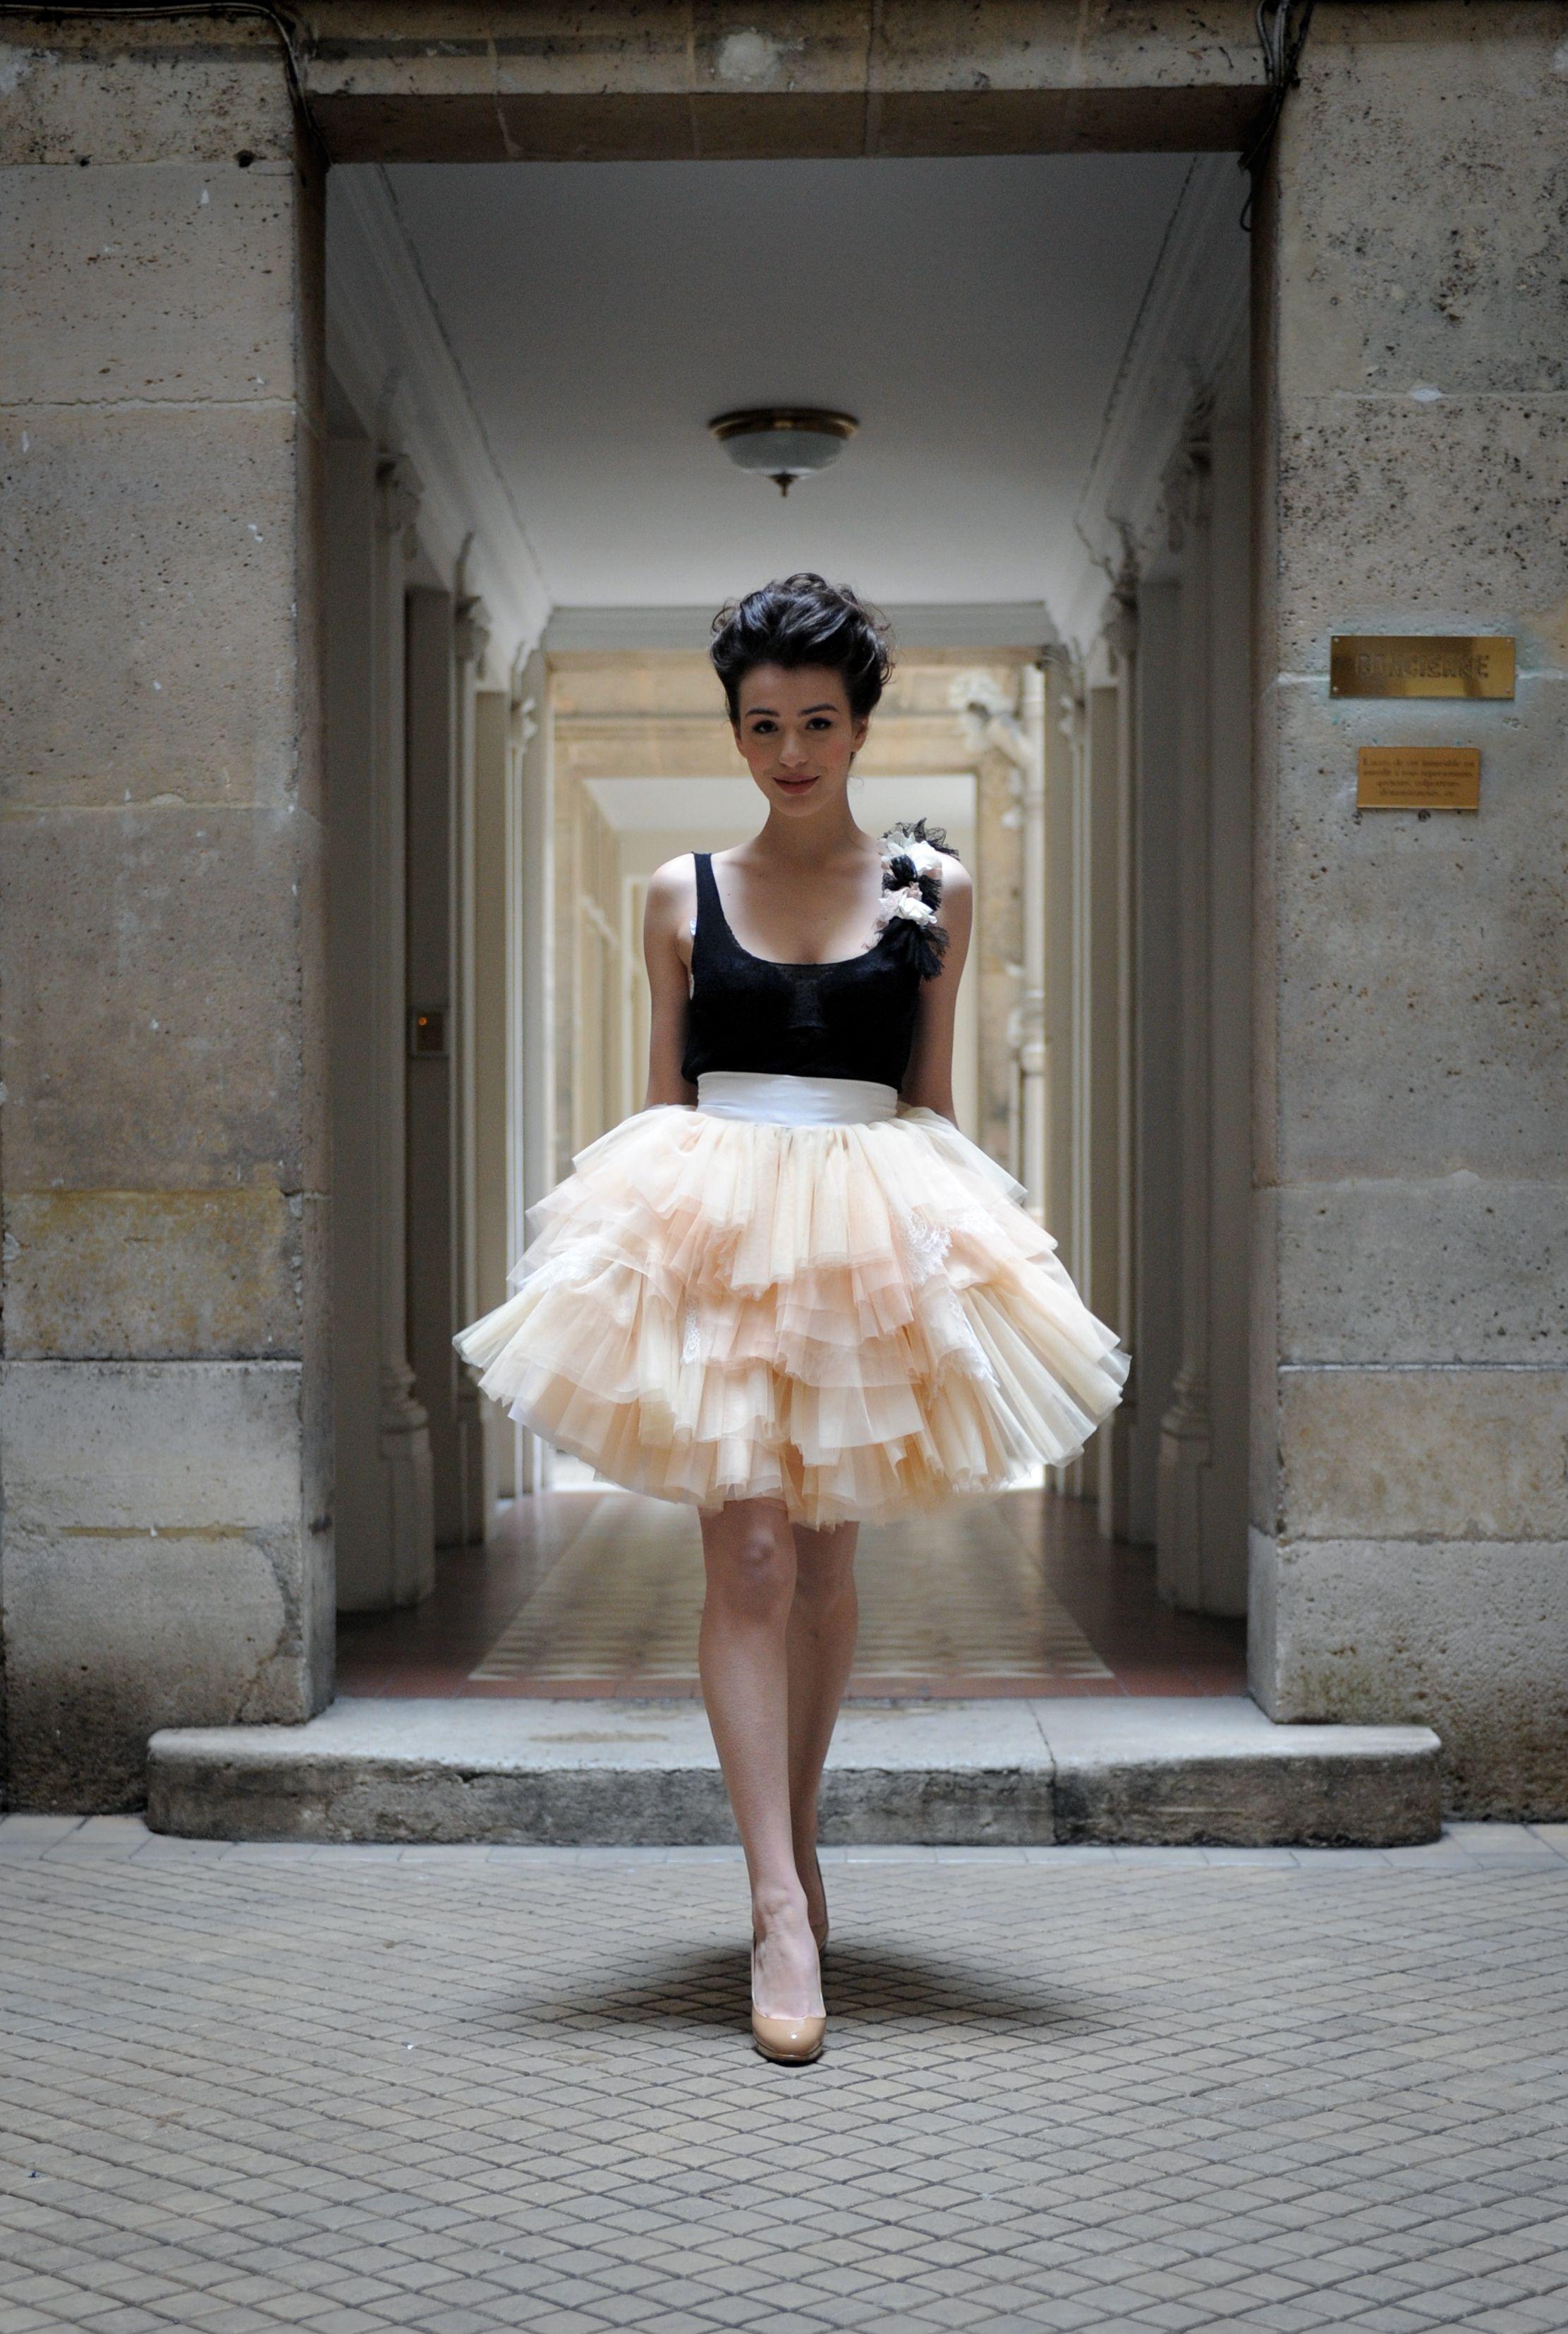 blog-mariage-la-mariee-aux-pieds-nus-meryl-suissa-creatrice-robe-de-mariee